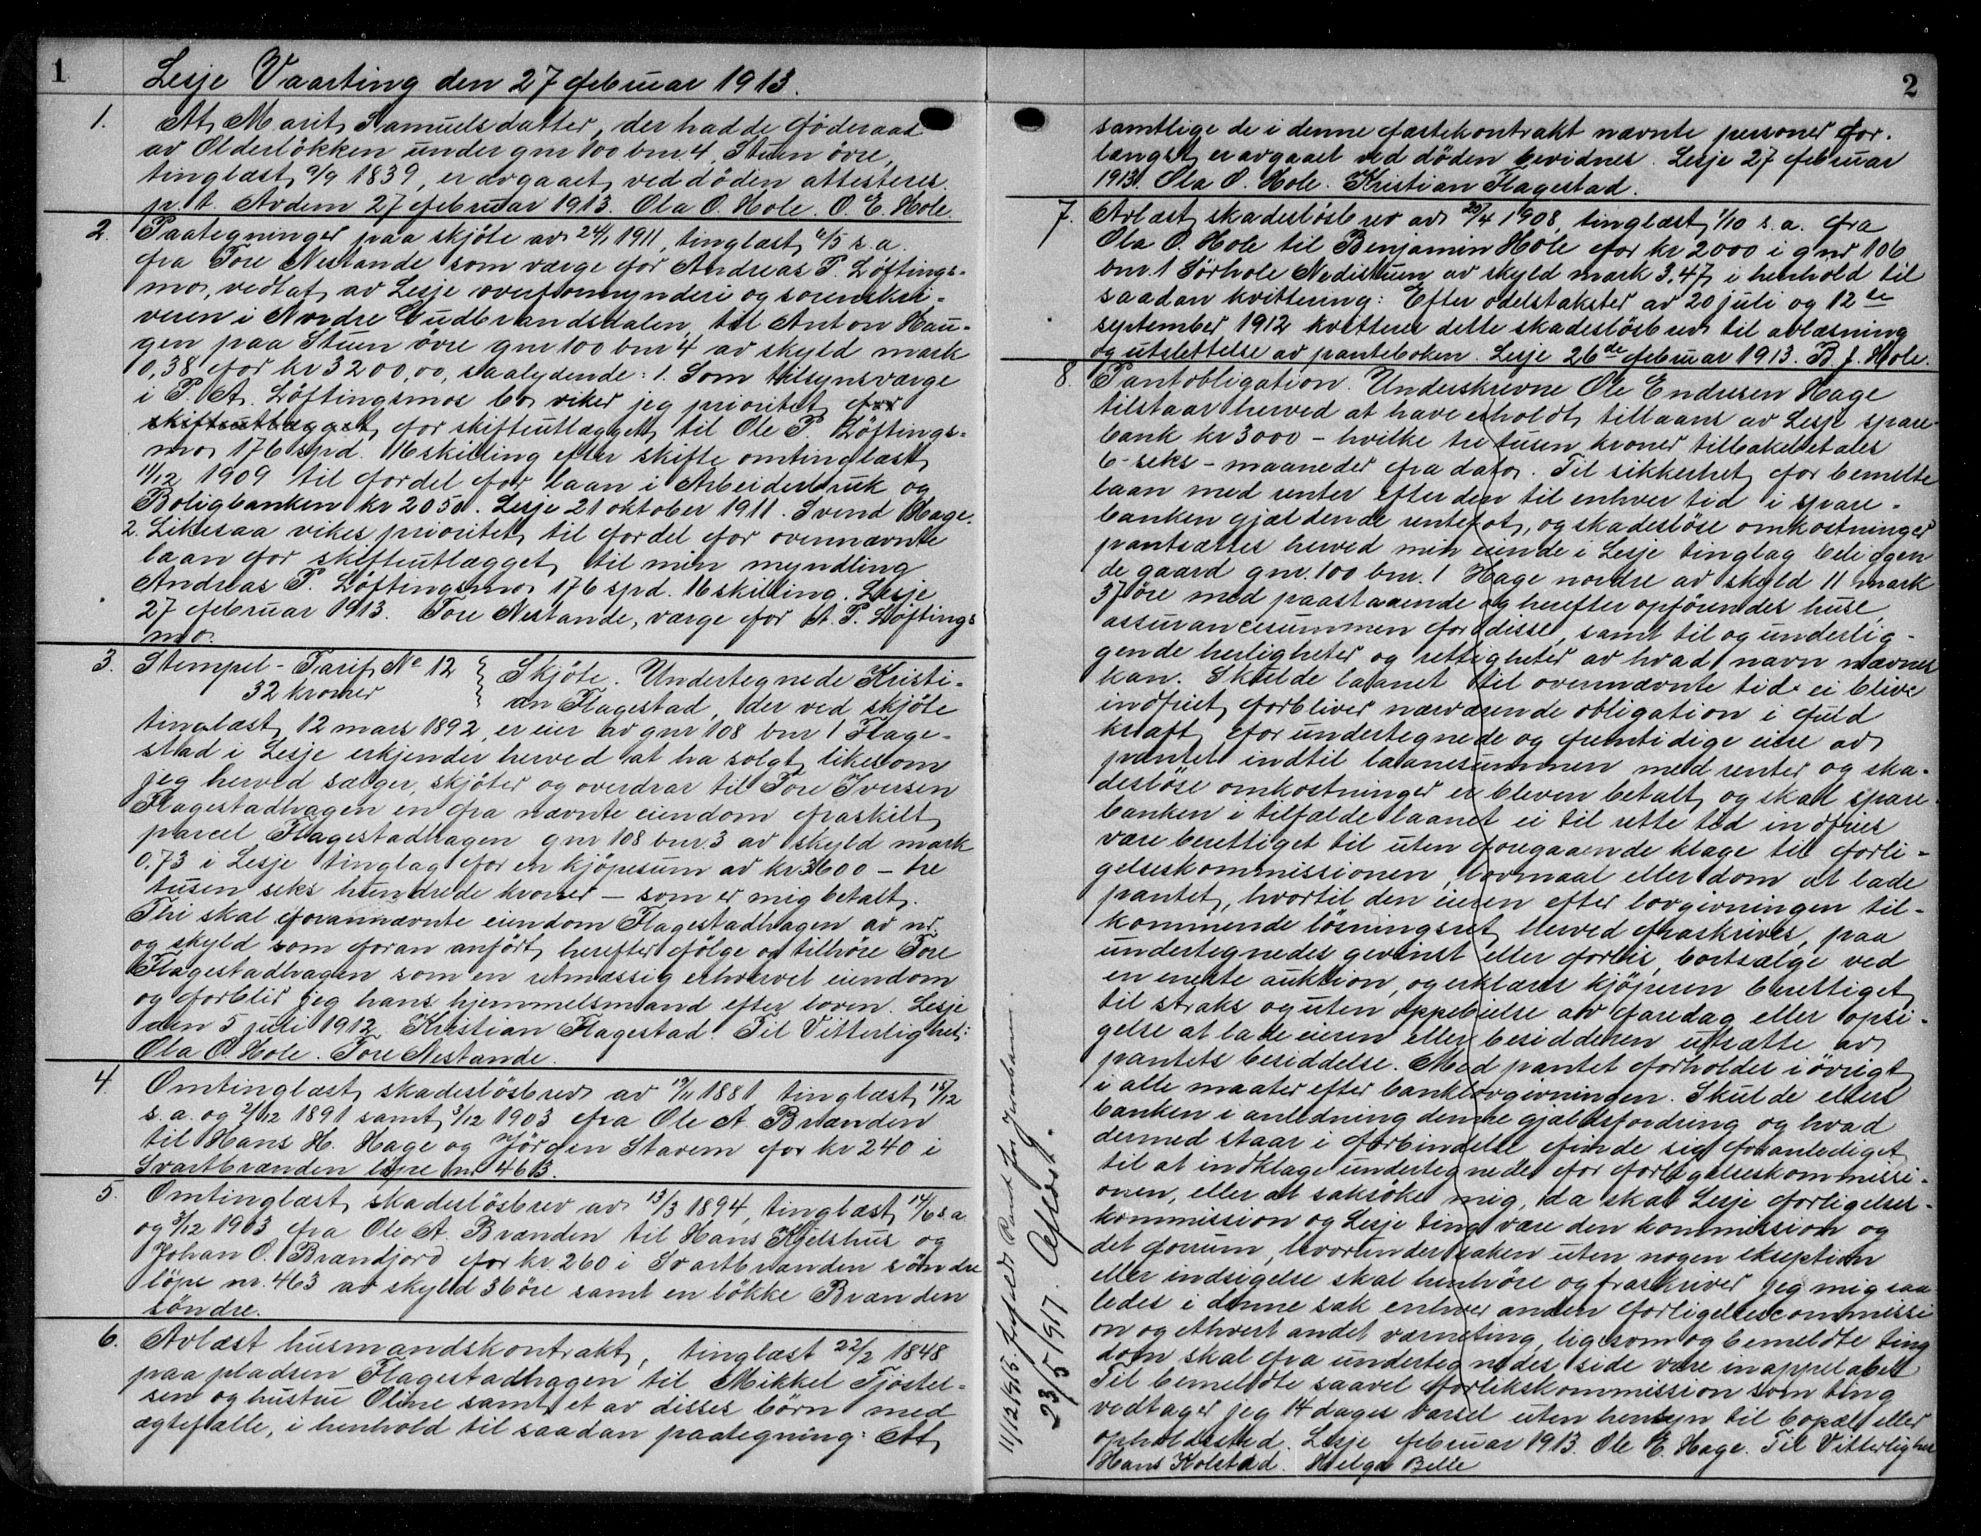 SAH, Nord-Gudbrandsdal tingrett, H/Hb/Hba/L0018: Pantebok nr. 18, 1913-1915, s. 1-2